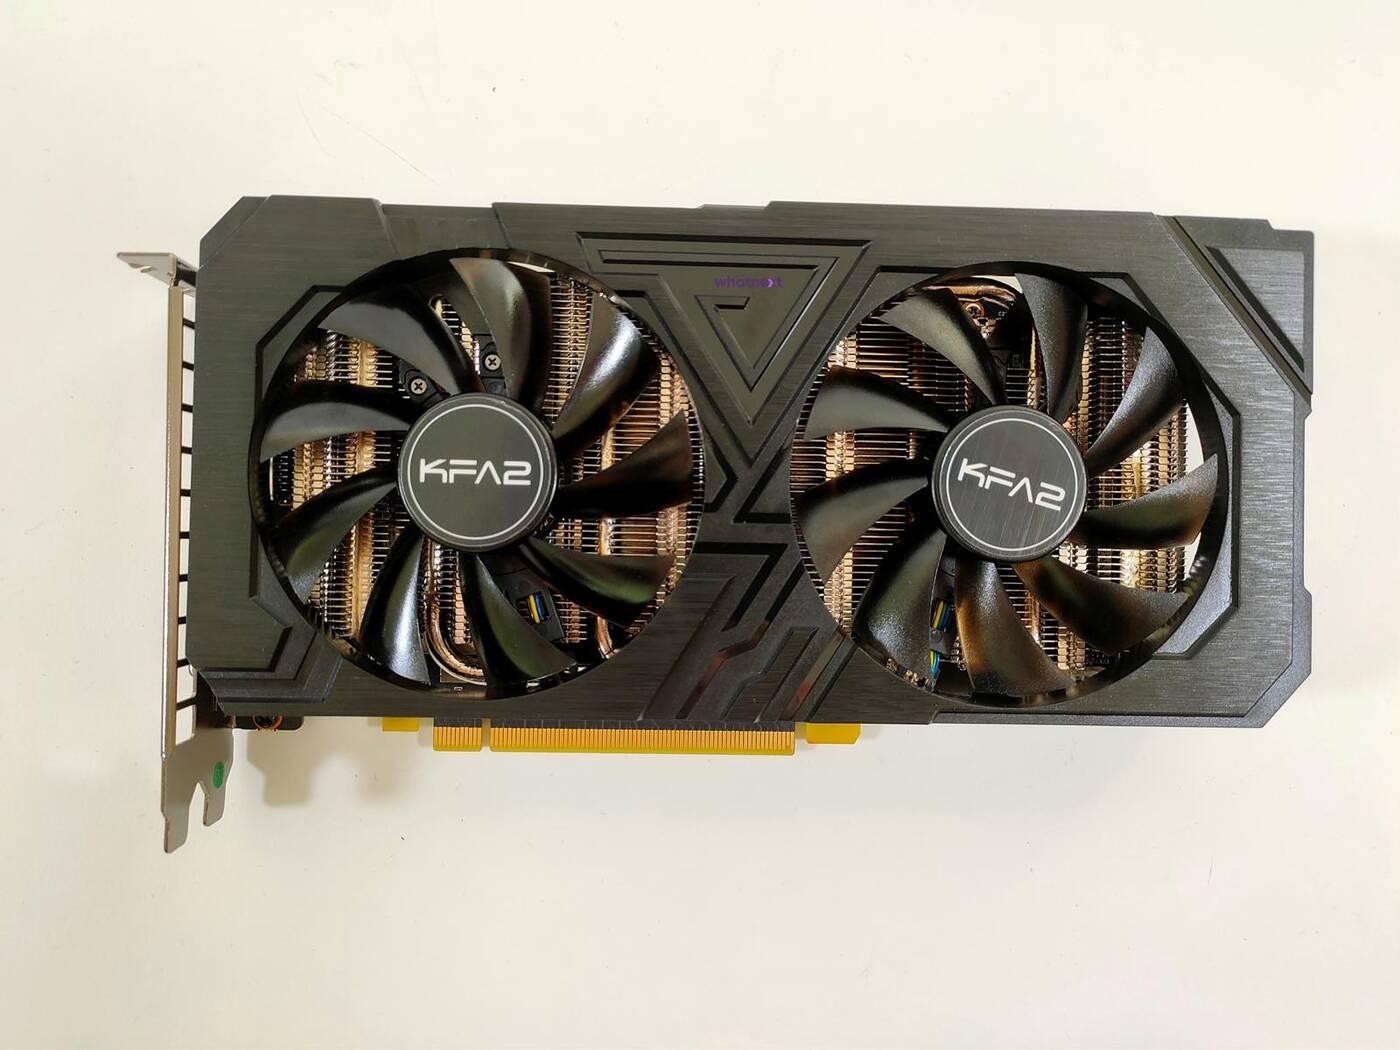 KFA2 GeForce GTX 1660 SUPER EX (1-Click OC), test KFA2 GeForce GTX 1660 SUPER EX (1-Click OC), recenzja KFA2 GeForce GTX 1660 SUPER EX (1-Click OC), , review KFA2 GeForce GTX 1660 SUPER EX (1-Click OC), , cena KFA2 GeForce GTX 1660 SUPER EX (1-Click OC), wydajność KFA2 GeForce GTX 1660 SUPER EX (1-Click OC),